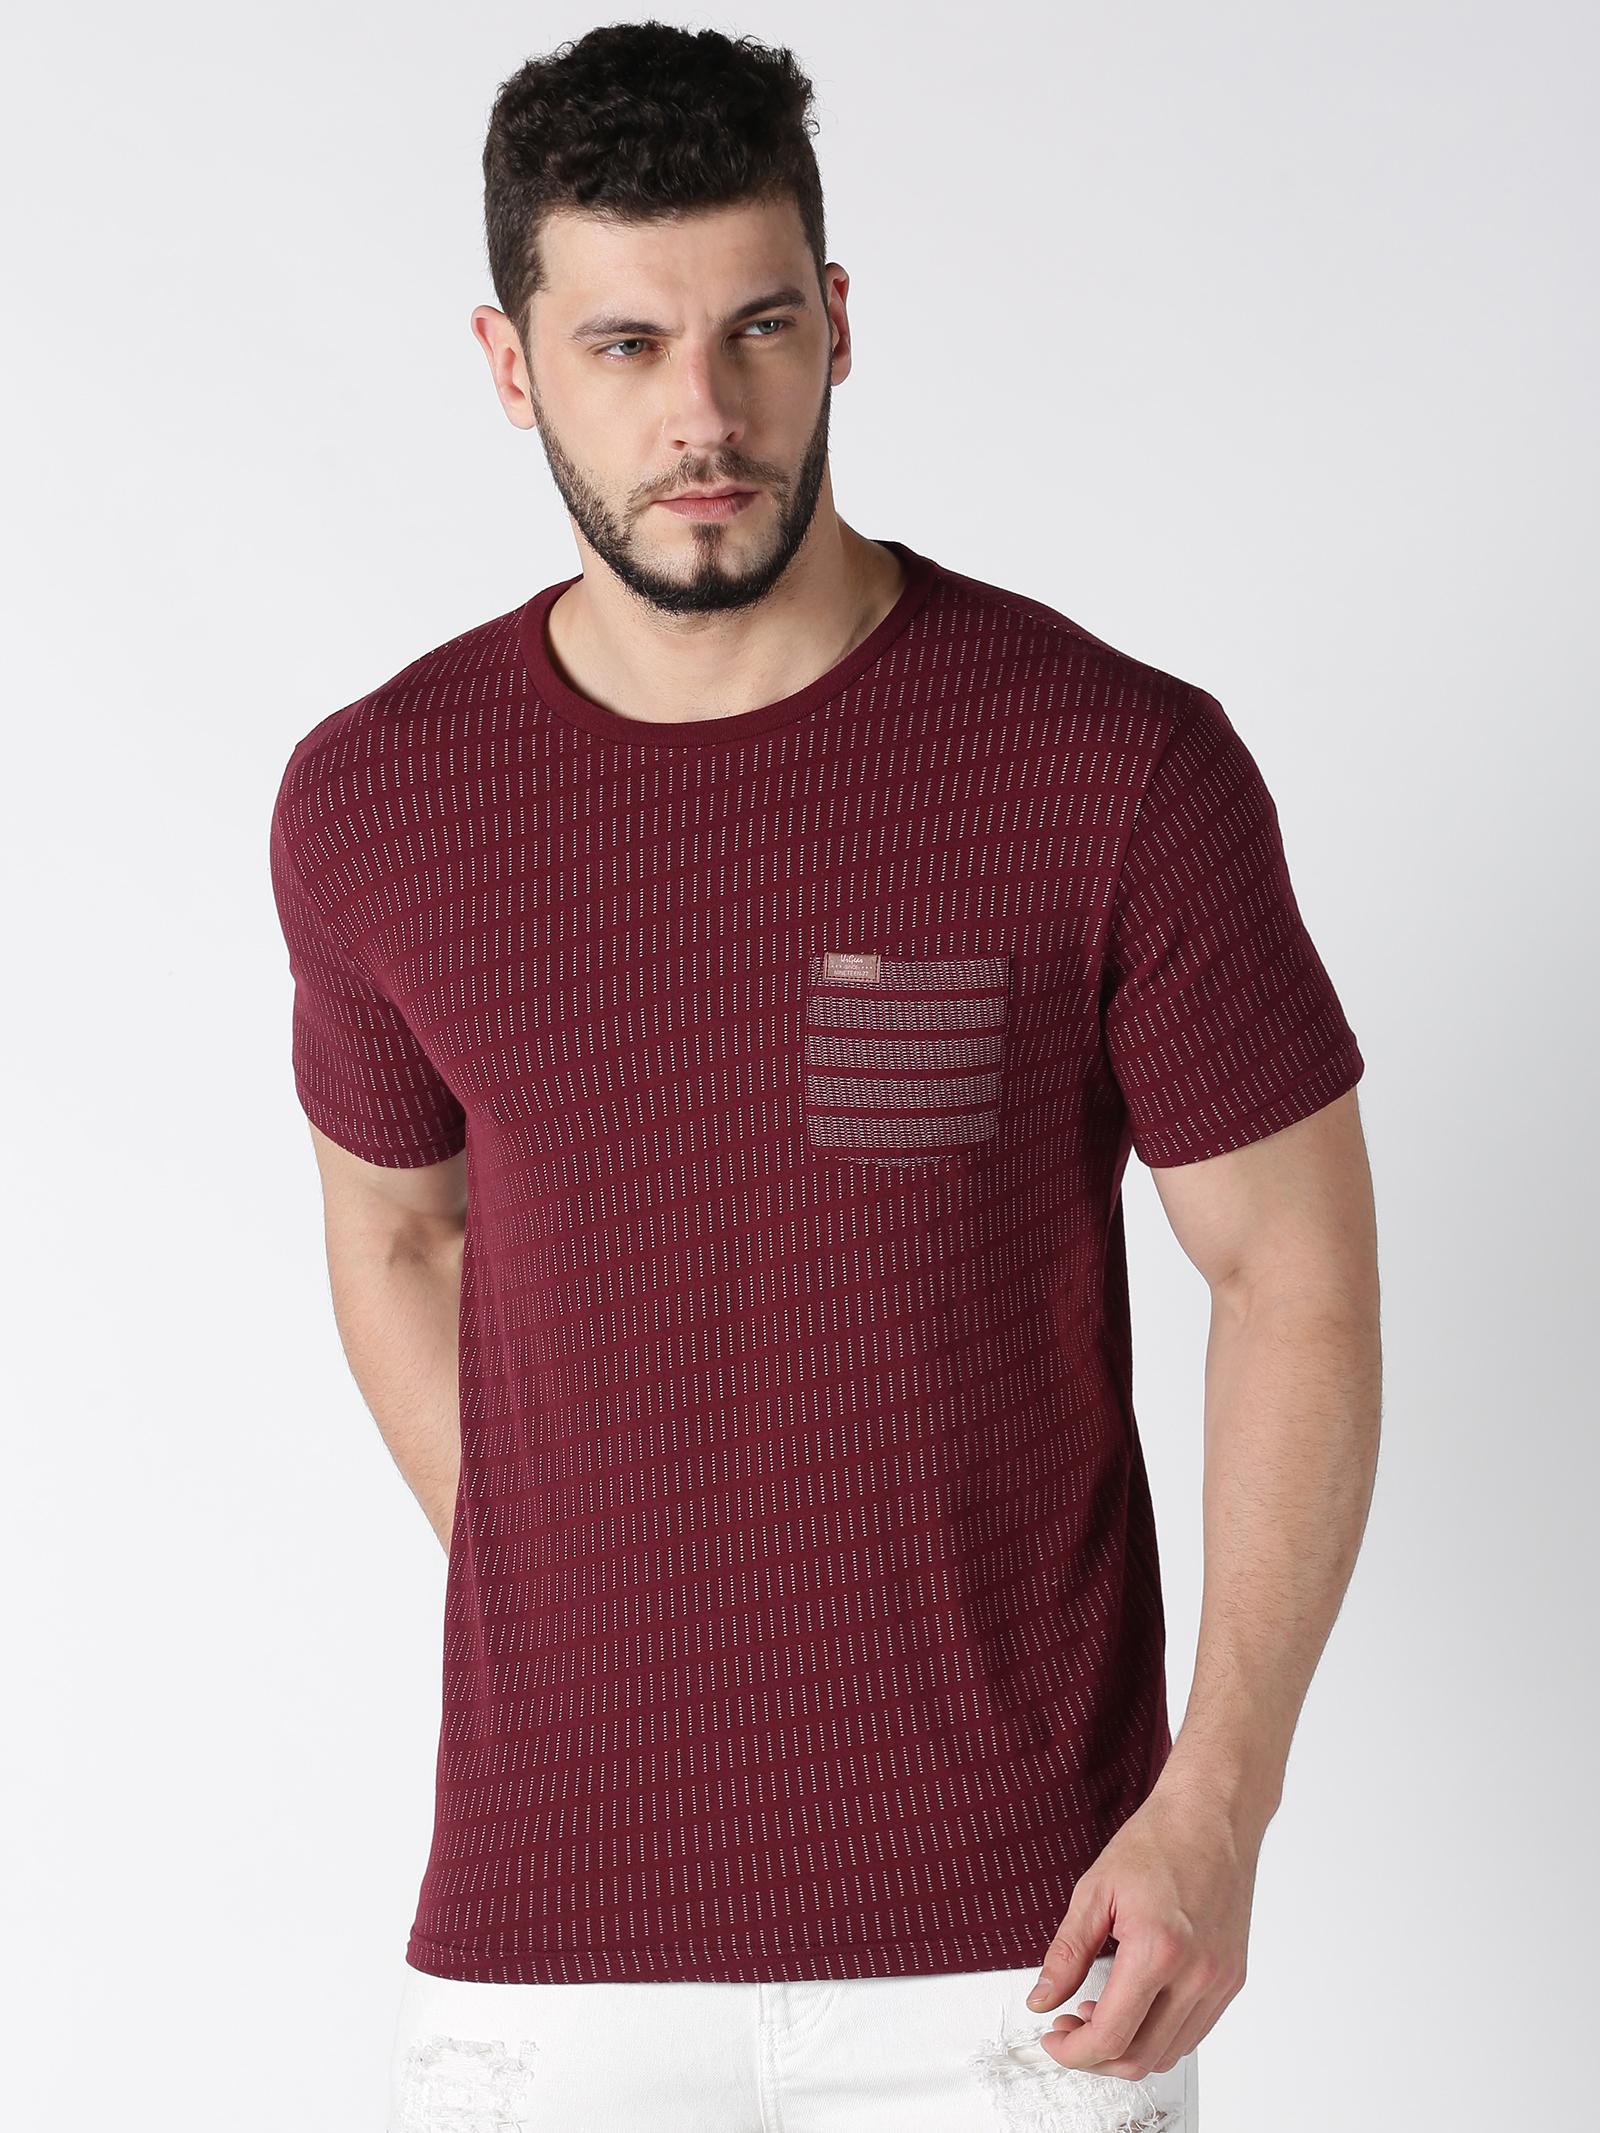 UrGear | UrGear Printed Men Round Neck Maroon T-Shirt